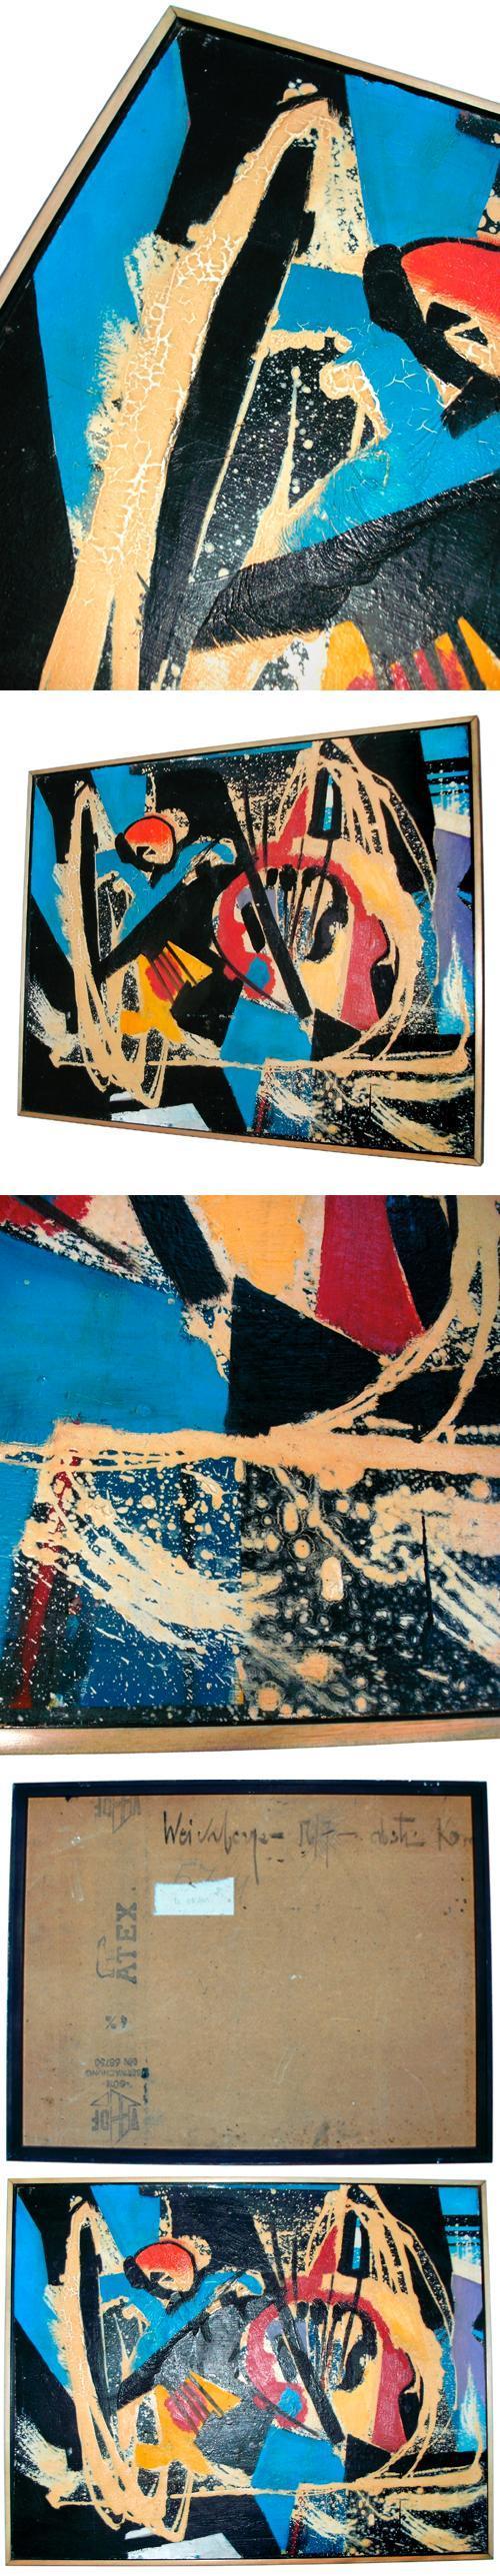 Philipp Weichberger - Frühe Abstraktion, 1956/57. kopen? Bied vanaf 1500!